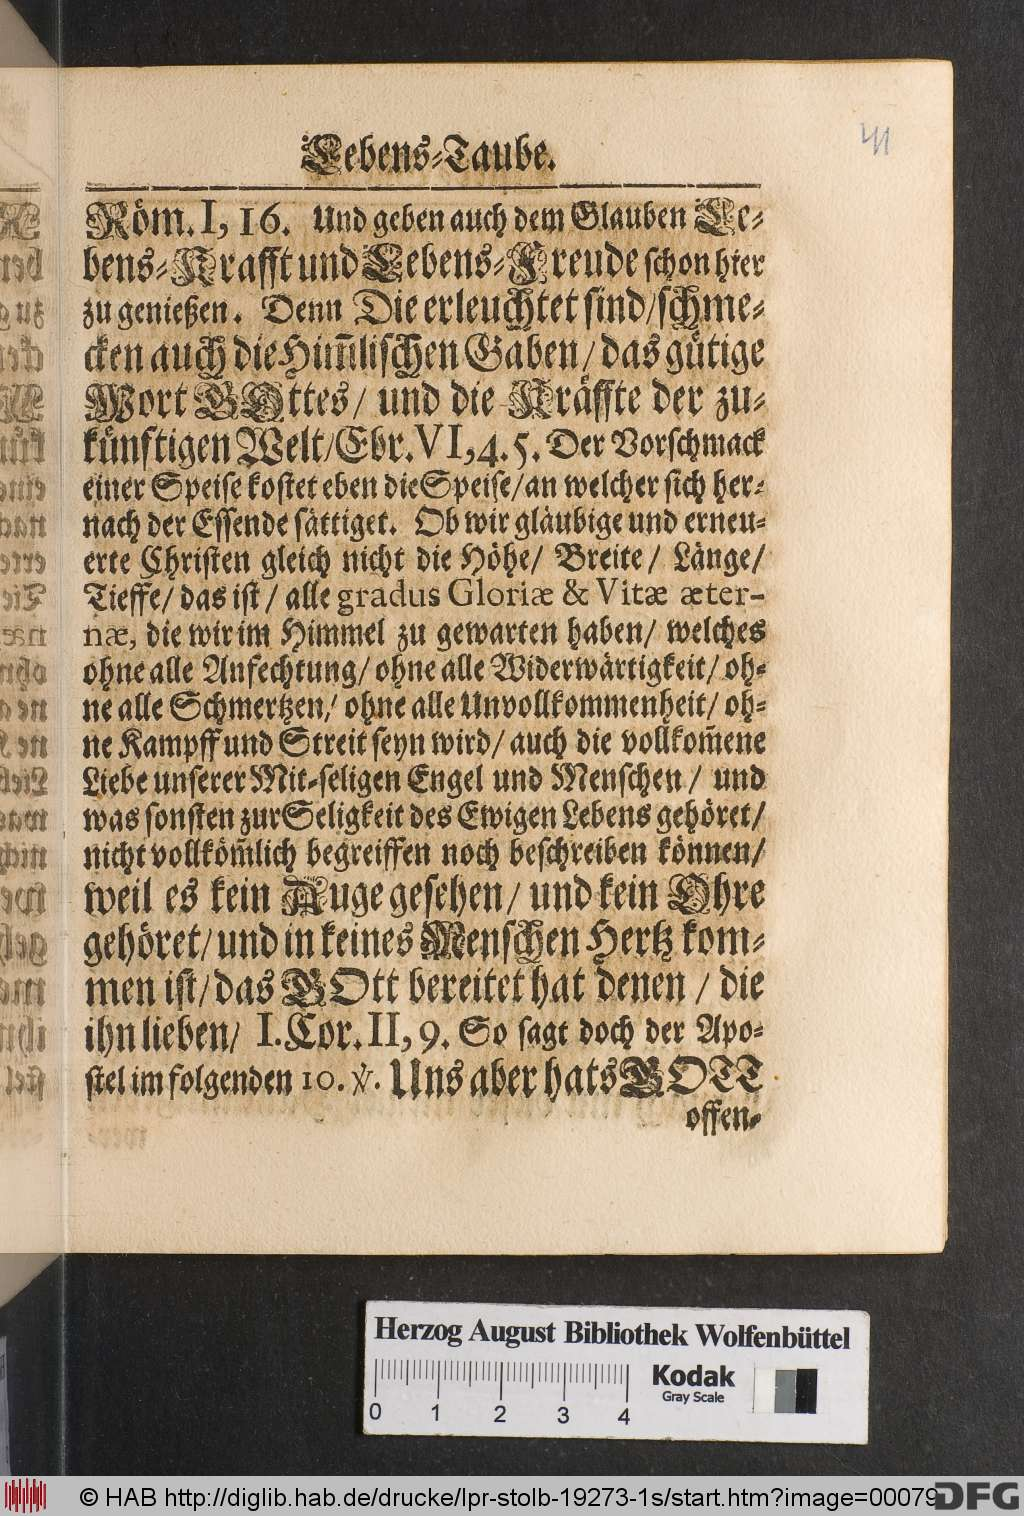 http://diglib.hab.de/drucke/lpr-stolb-19273-1s/00079.jpg